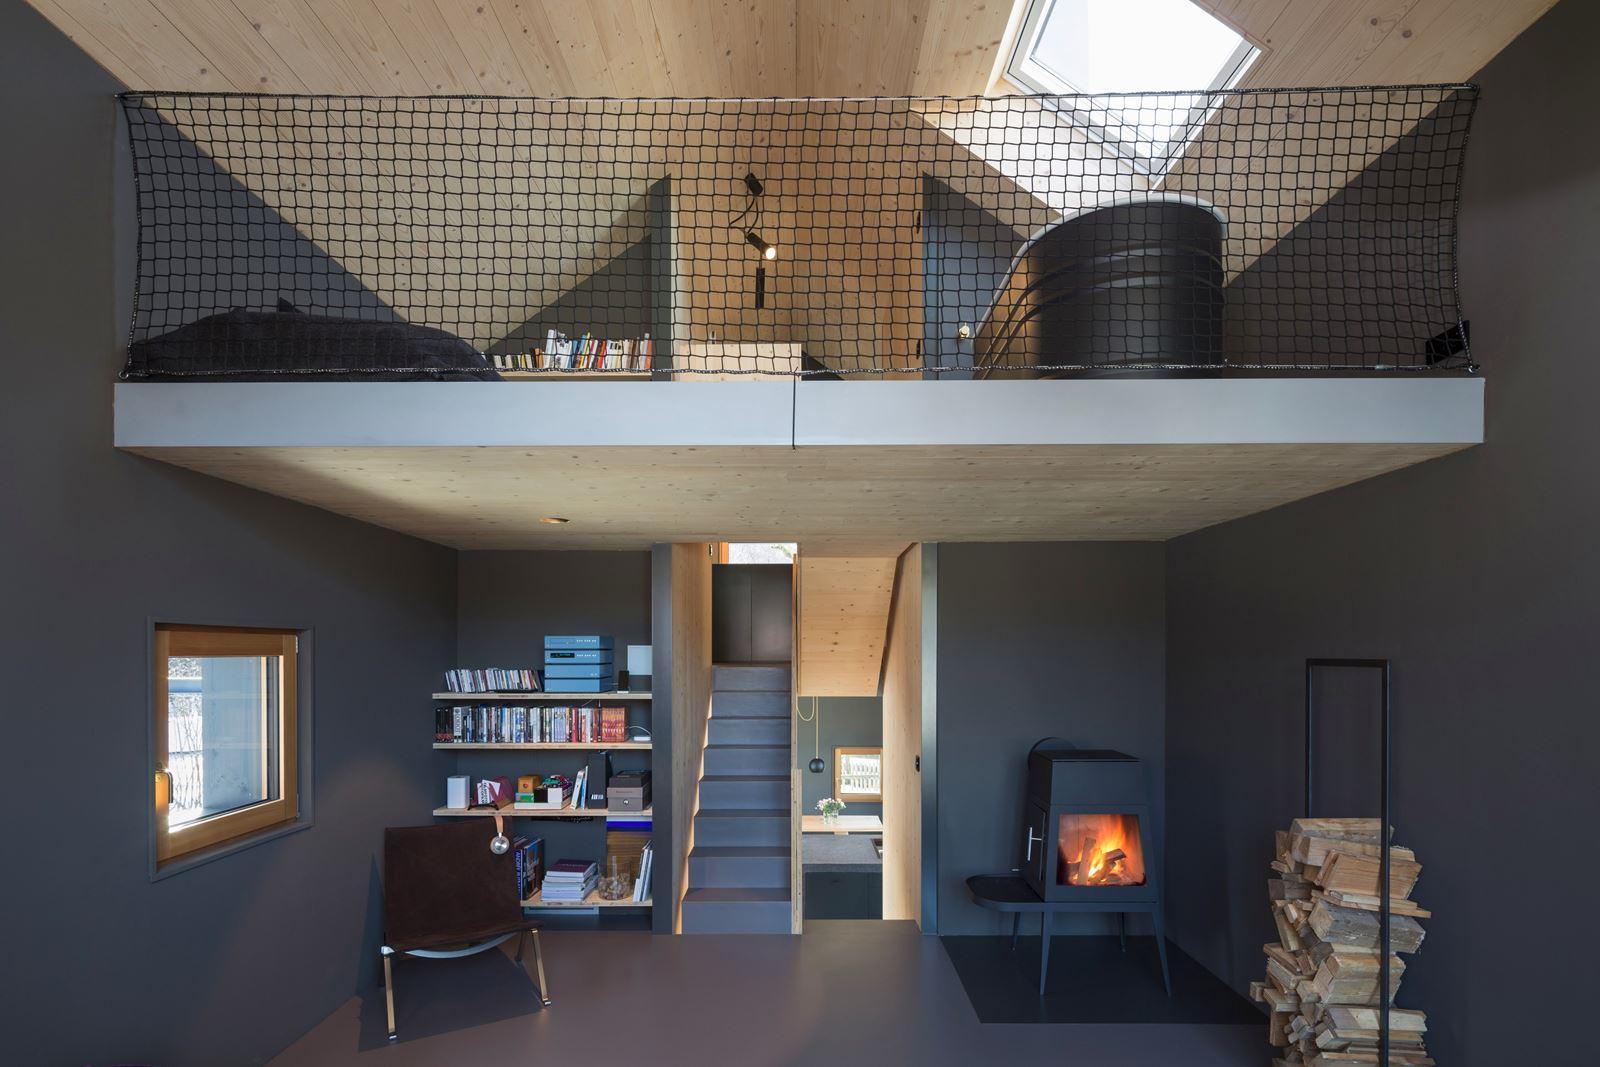 Un casa in legno a risparmio energetico - Casa a risparmio energetico ...